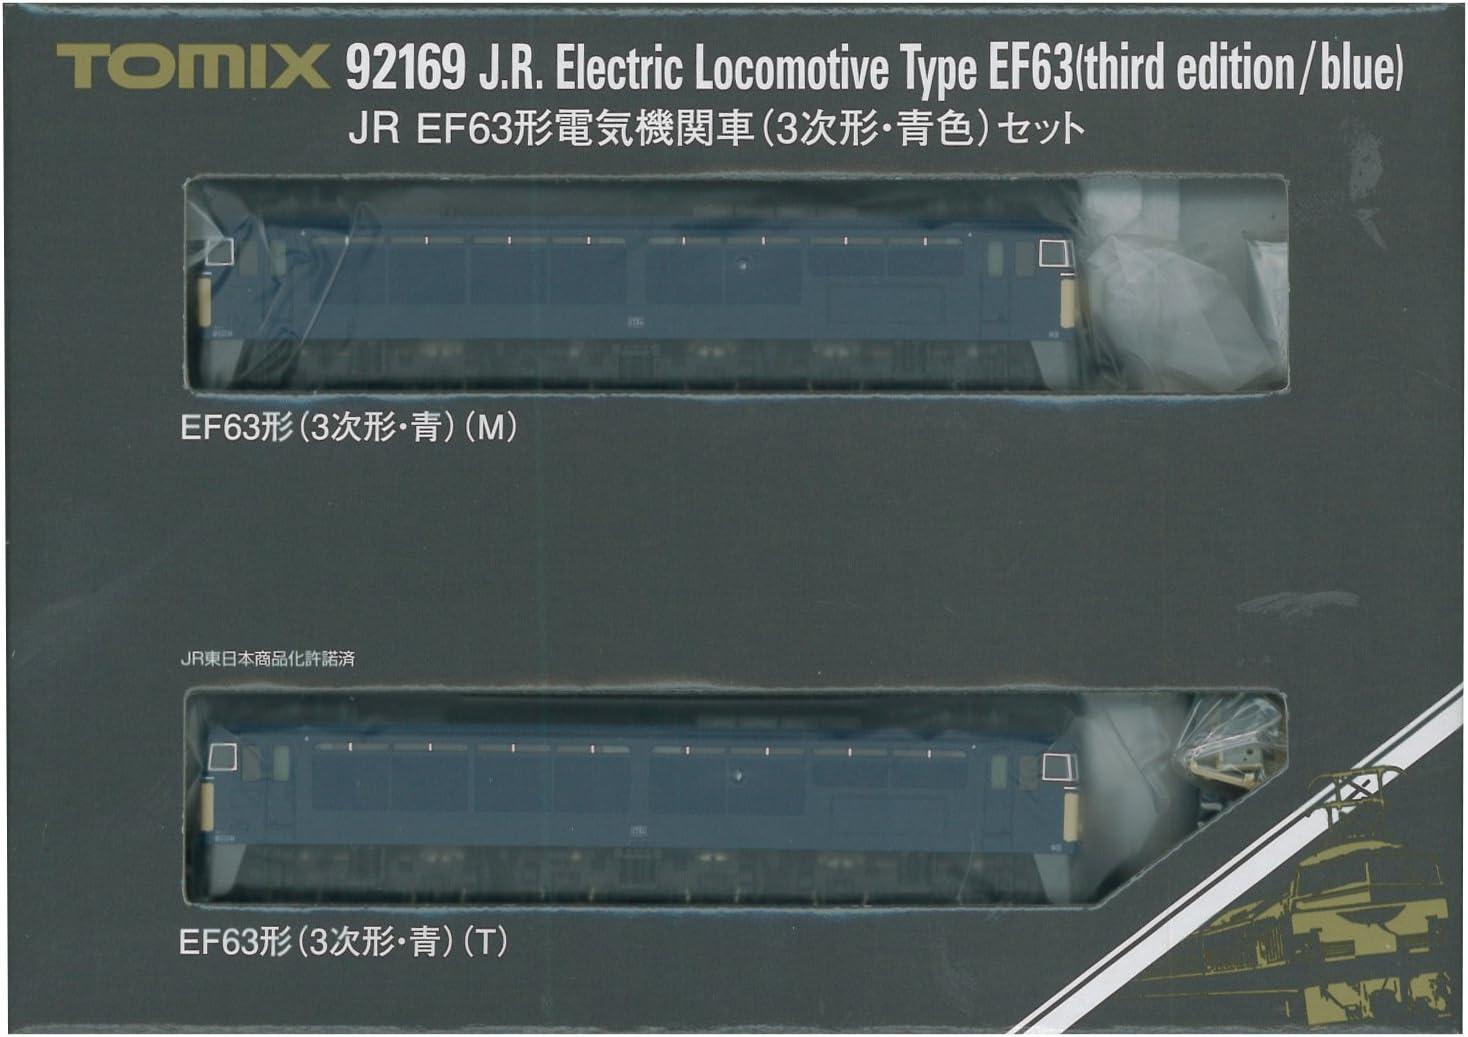 TOMIX Nゲージ EF63 3次形 青色 セット 92169 鉄道模型 電気機関車